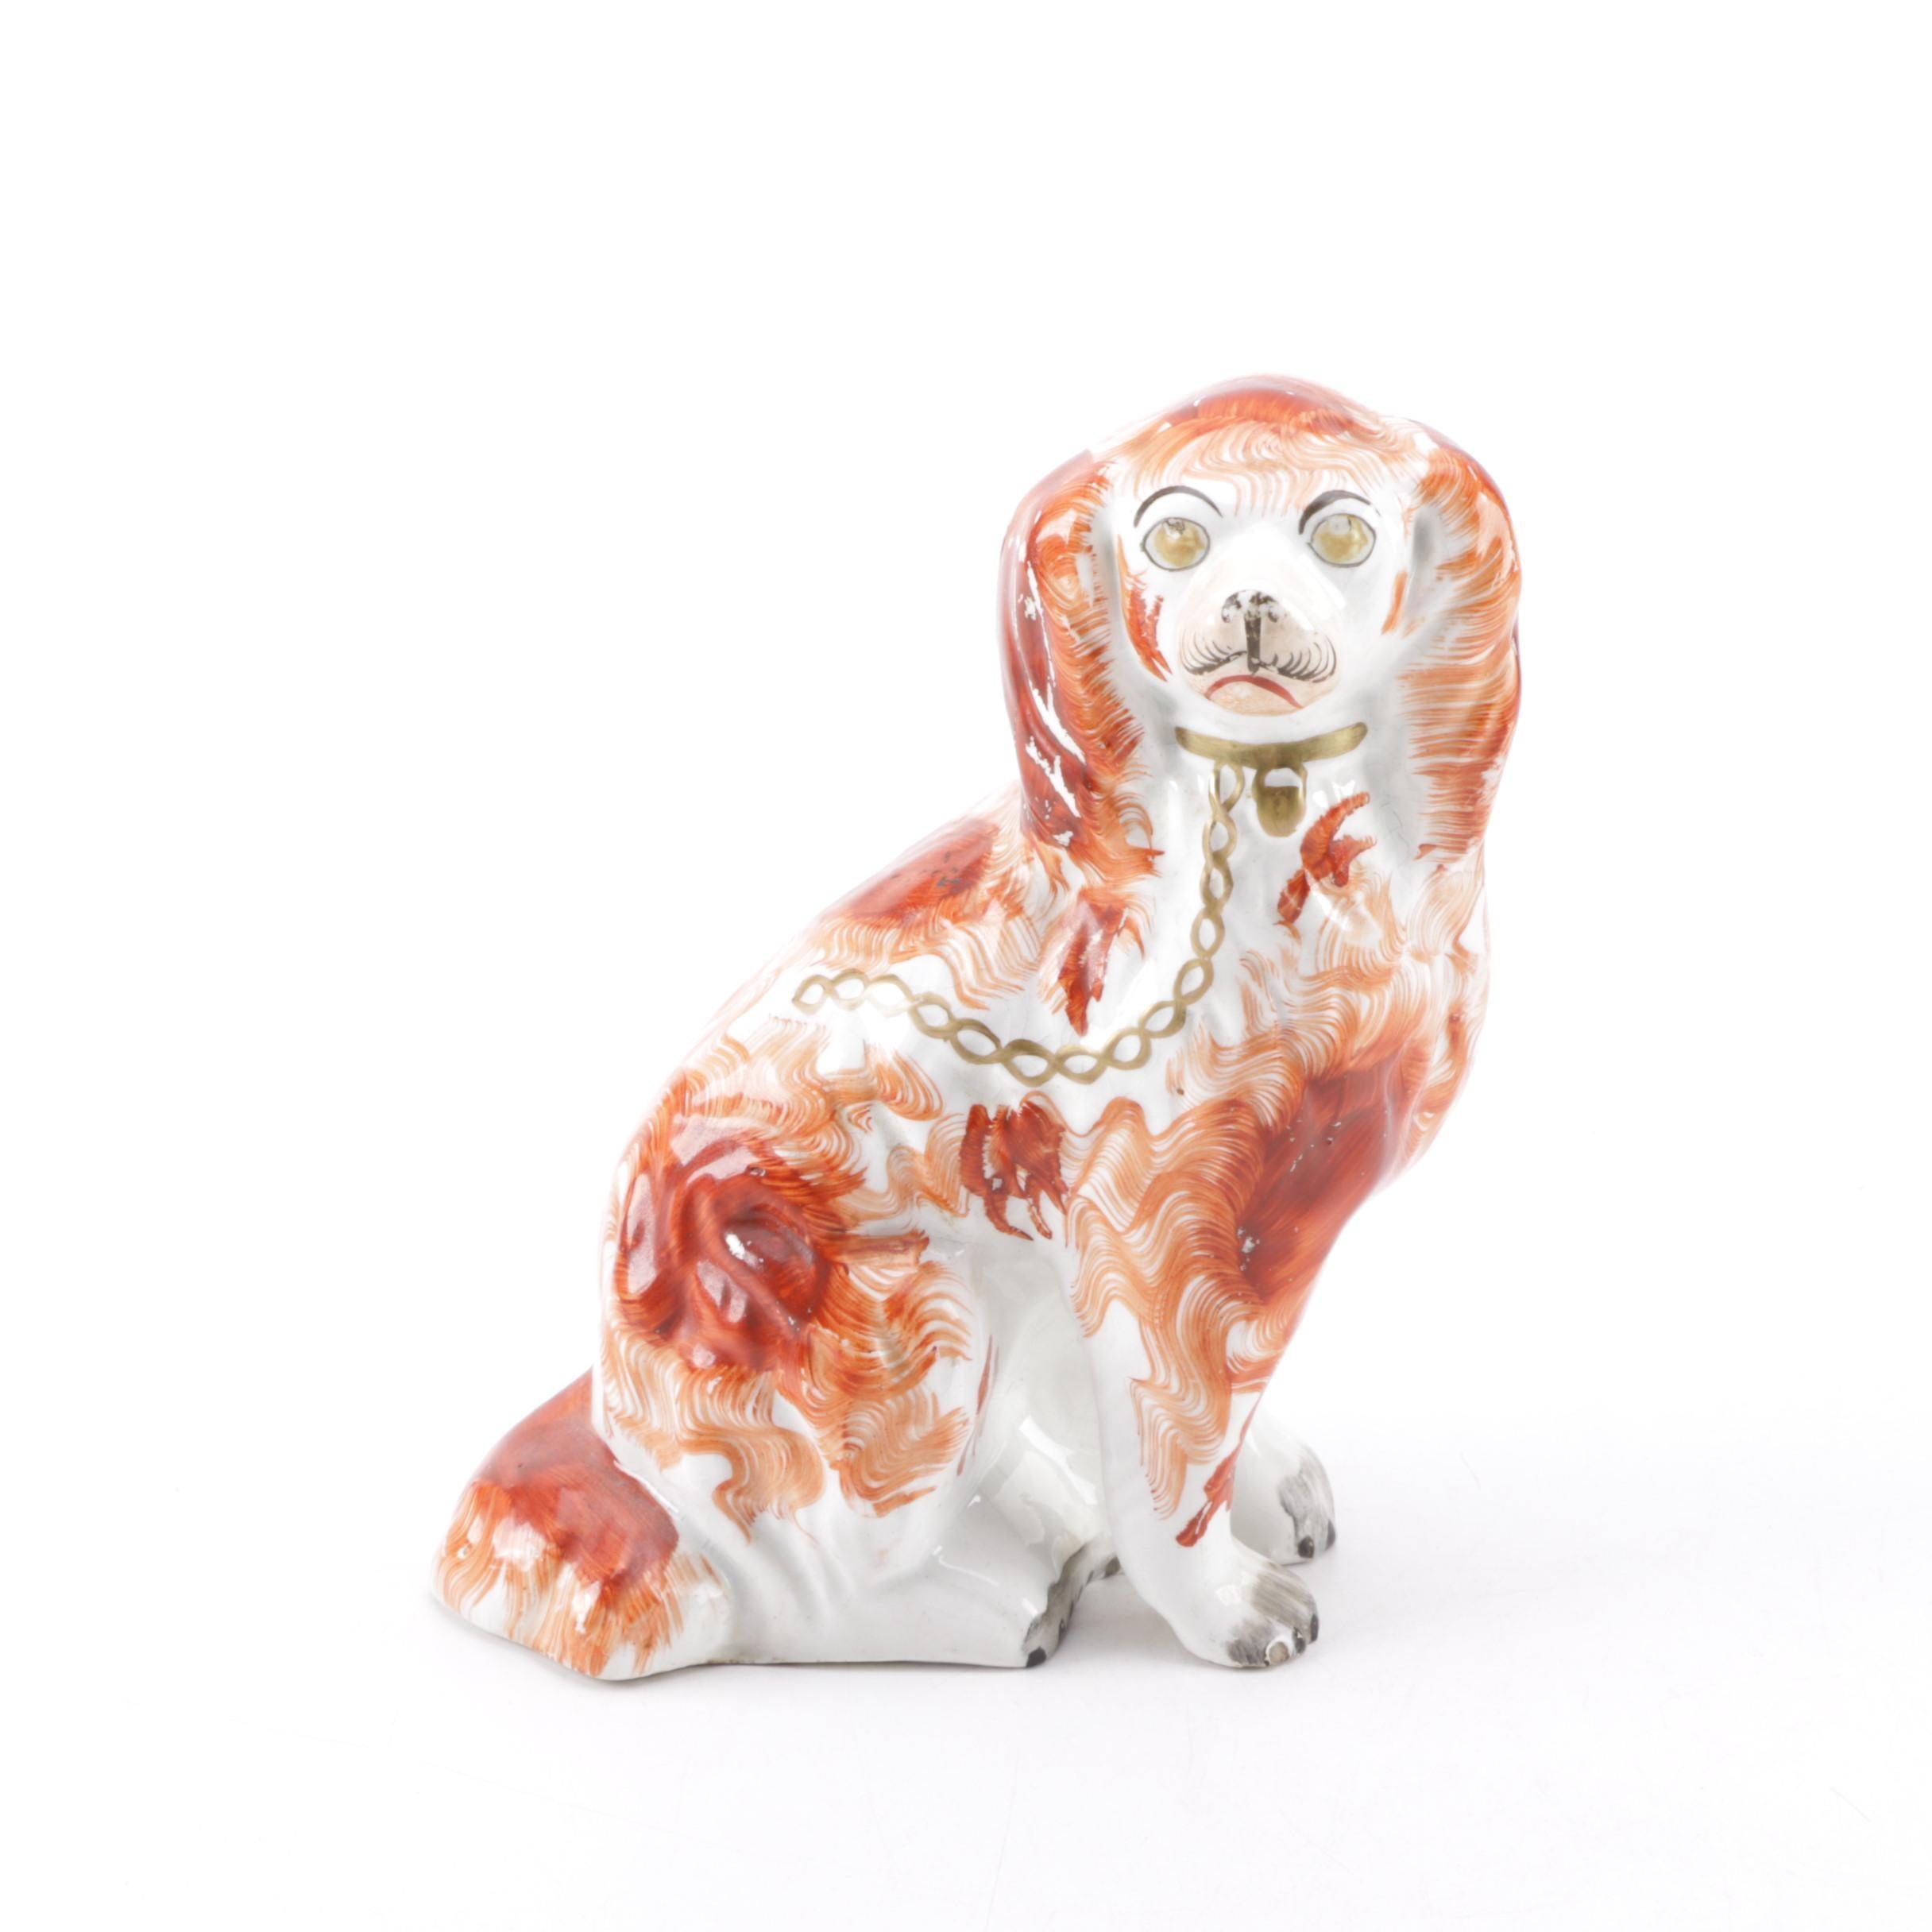 Staffordshire-Style Ceramic Dog Figurine